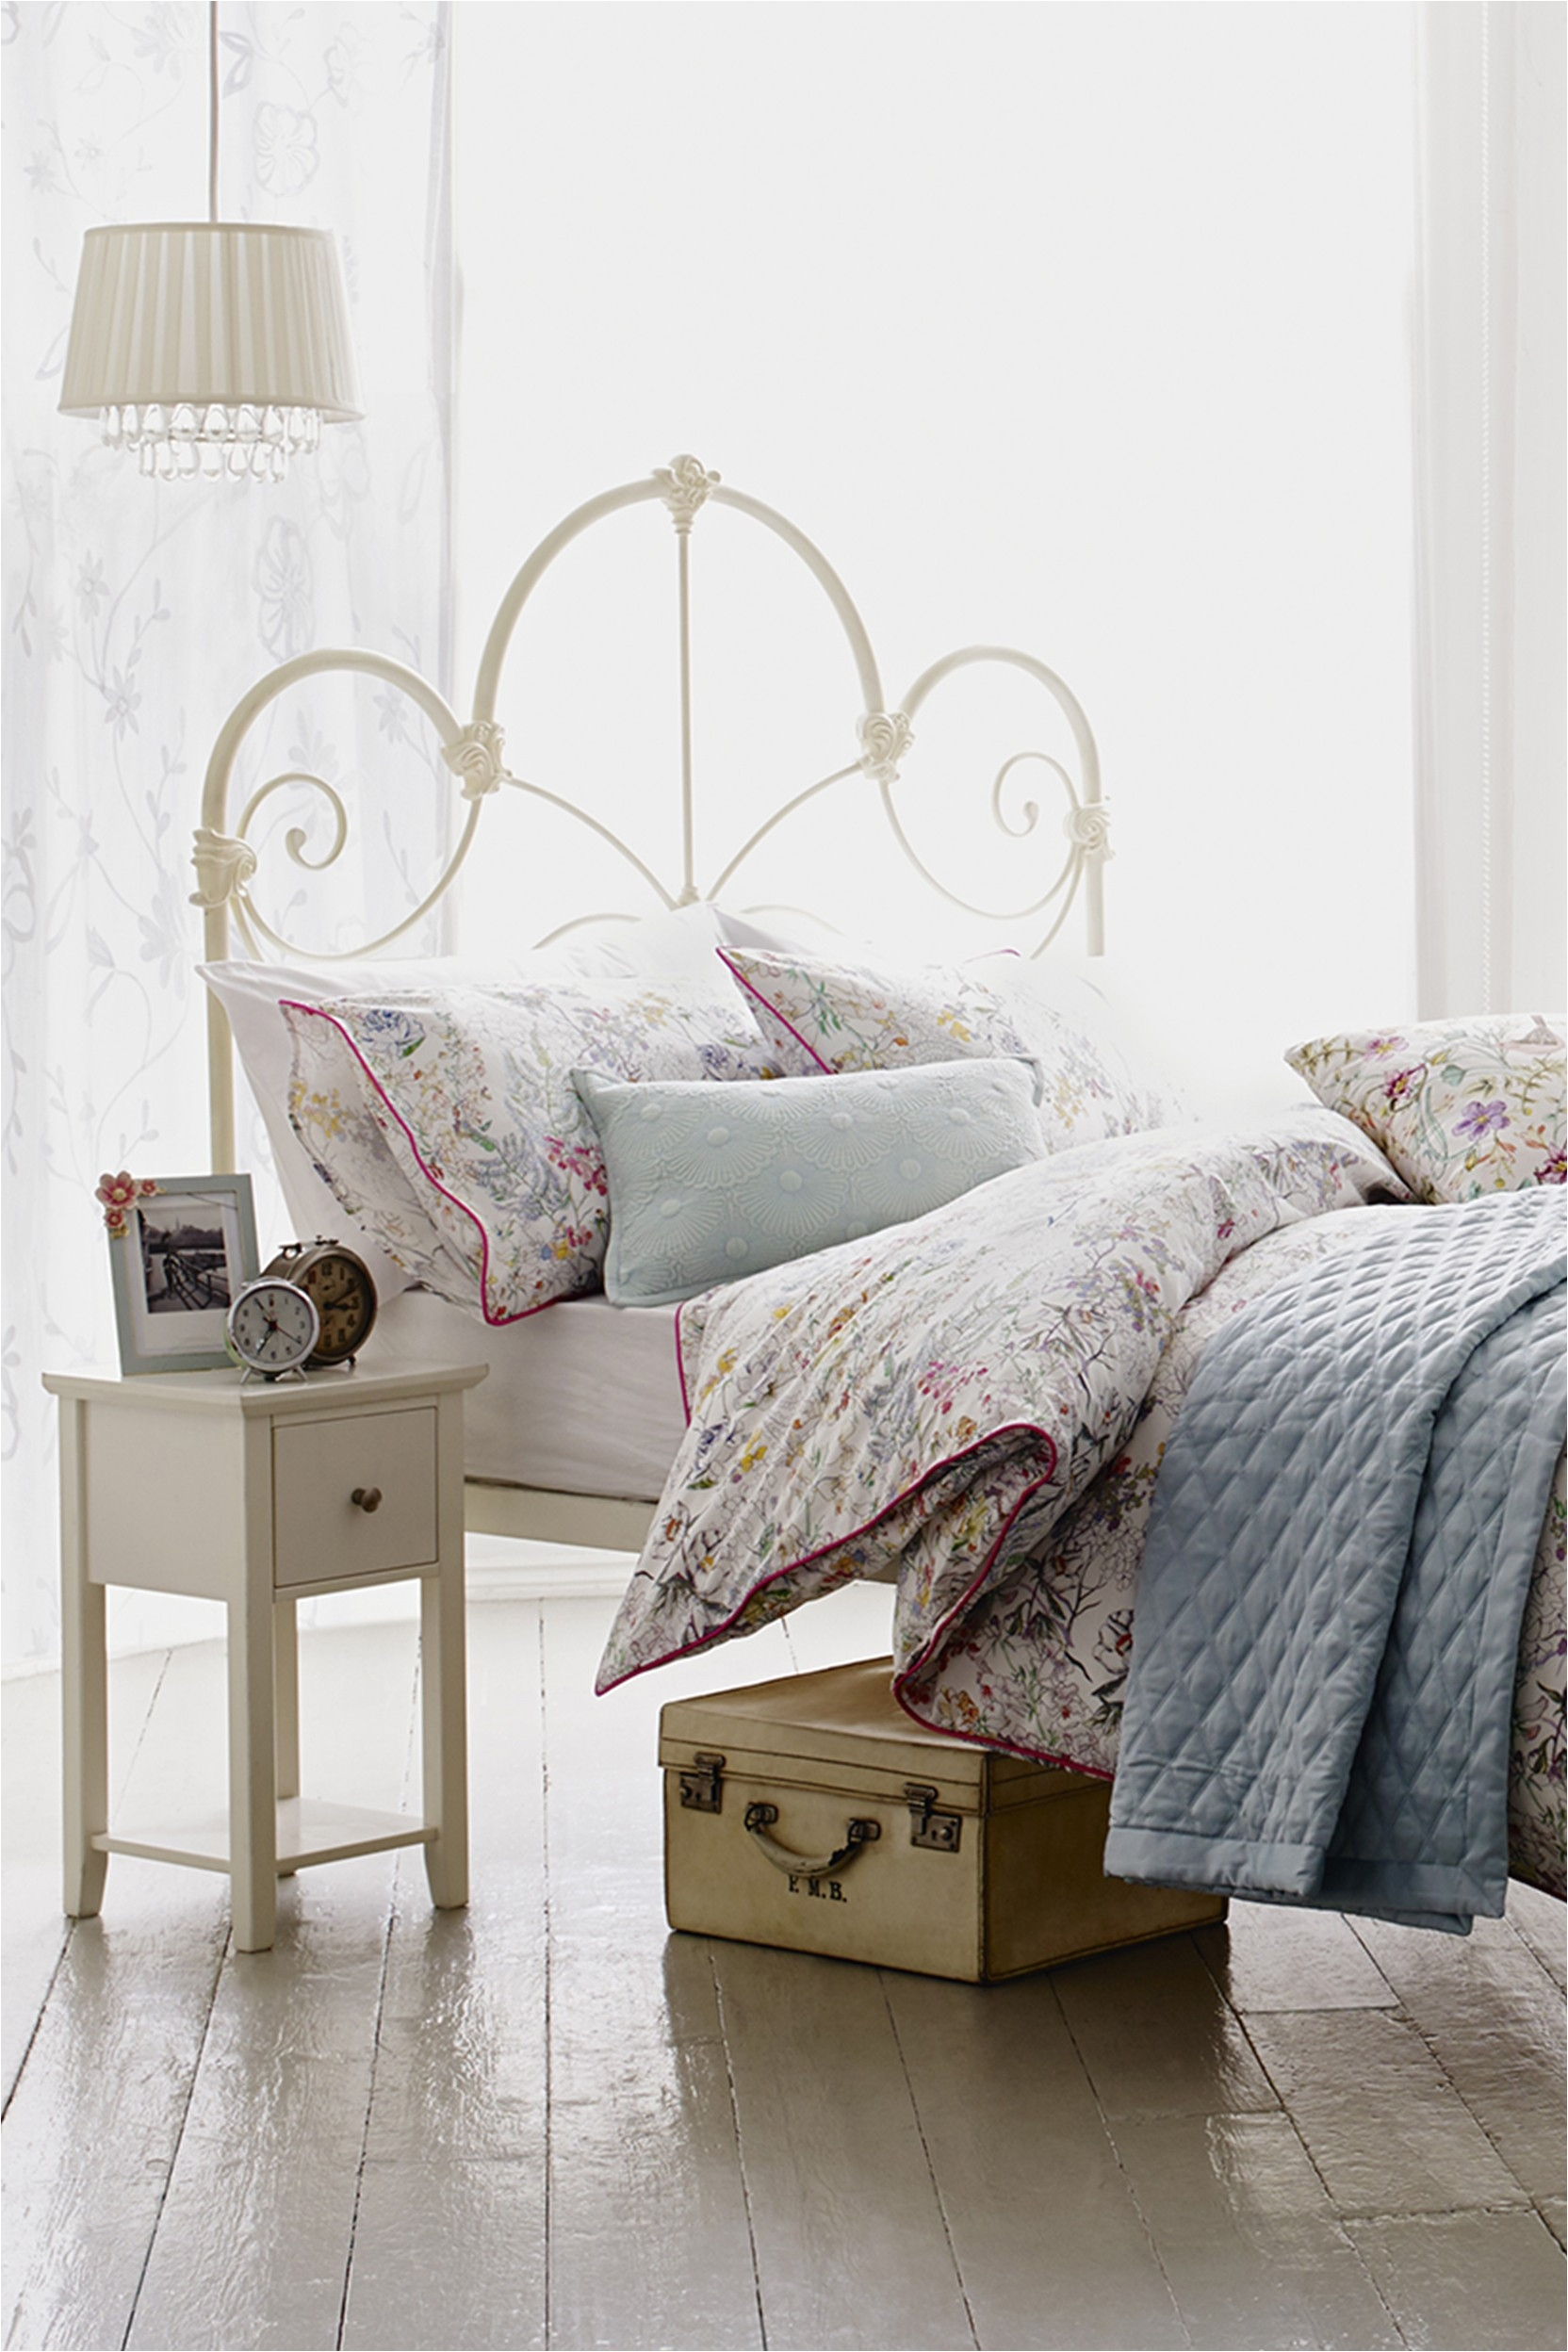 Fetching Furniture Stores Bedroom Sets In Western Bedroom Sets